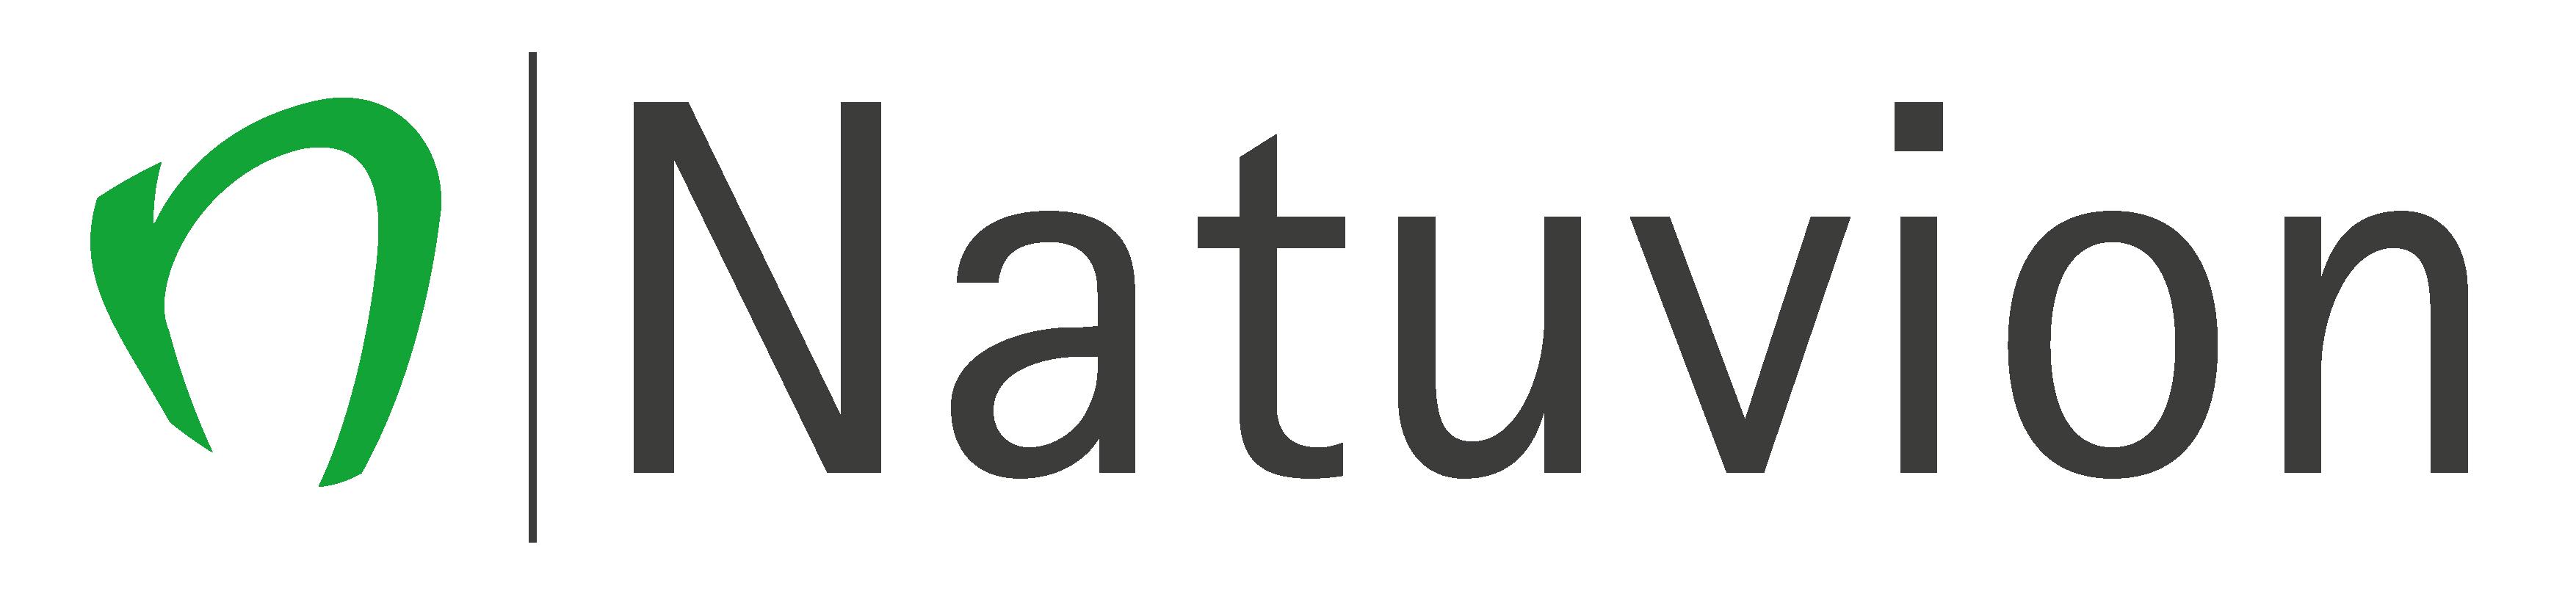 natuvion_logo_gruen_schwarz_rgb-01